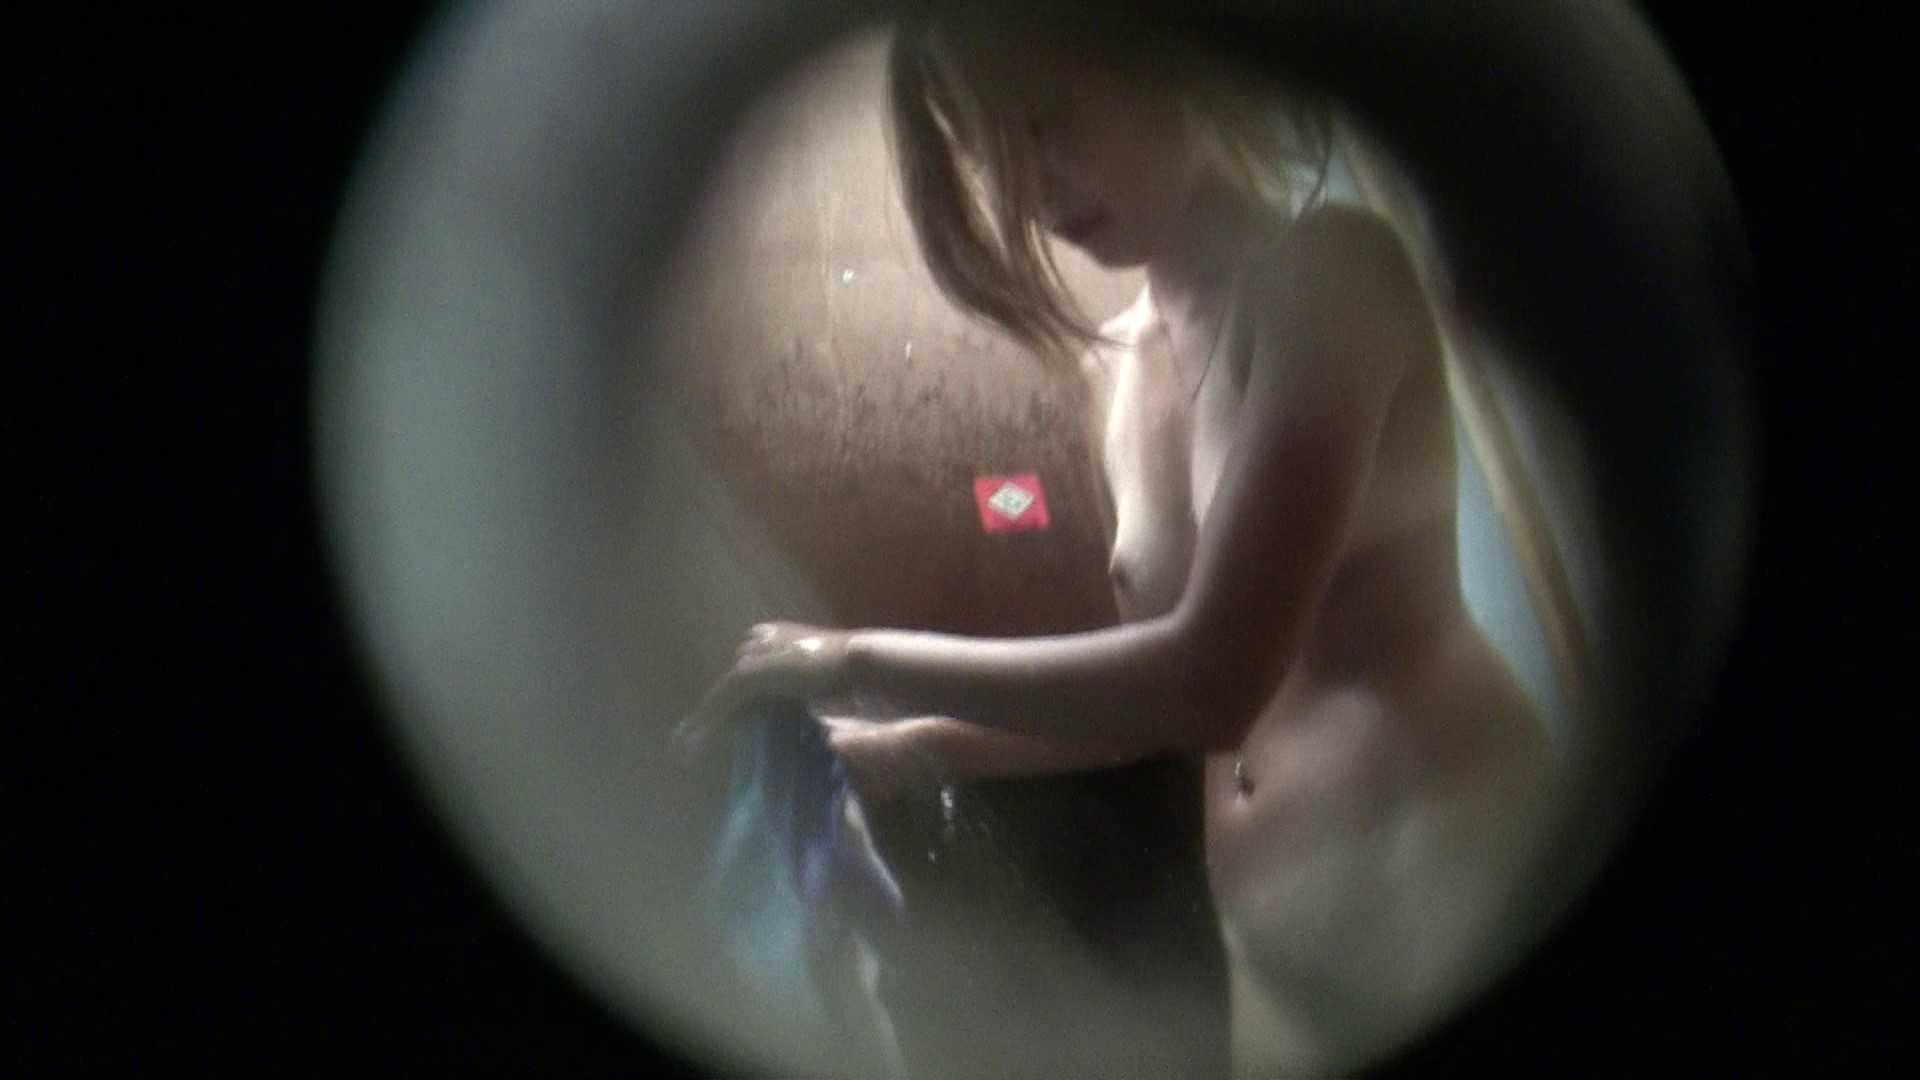 NO.02 見事に日焼けした年齢不詳のお女市さん シャワー室 ワレメ無修正動画無料 91枚 59